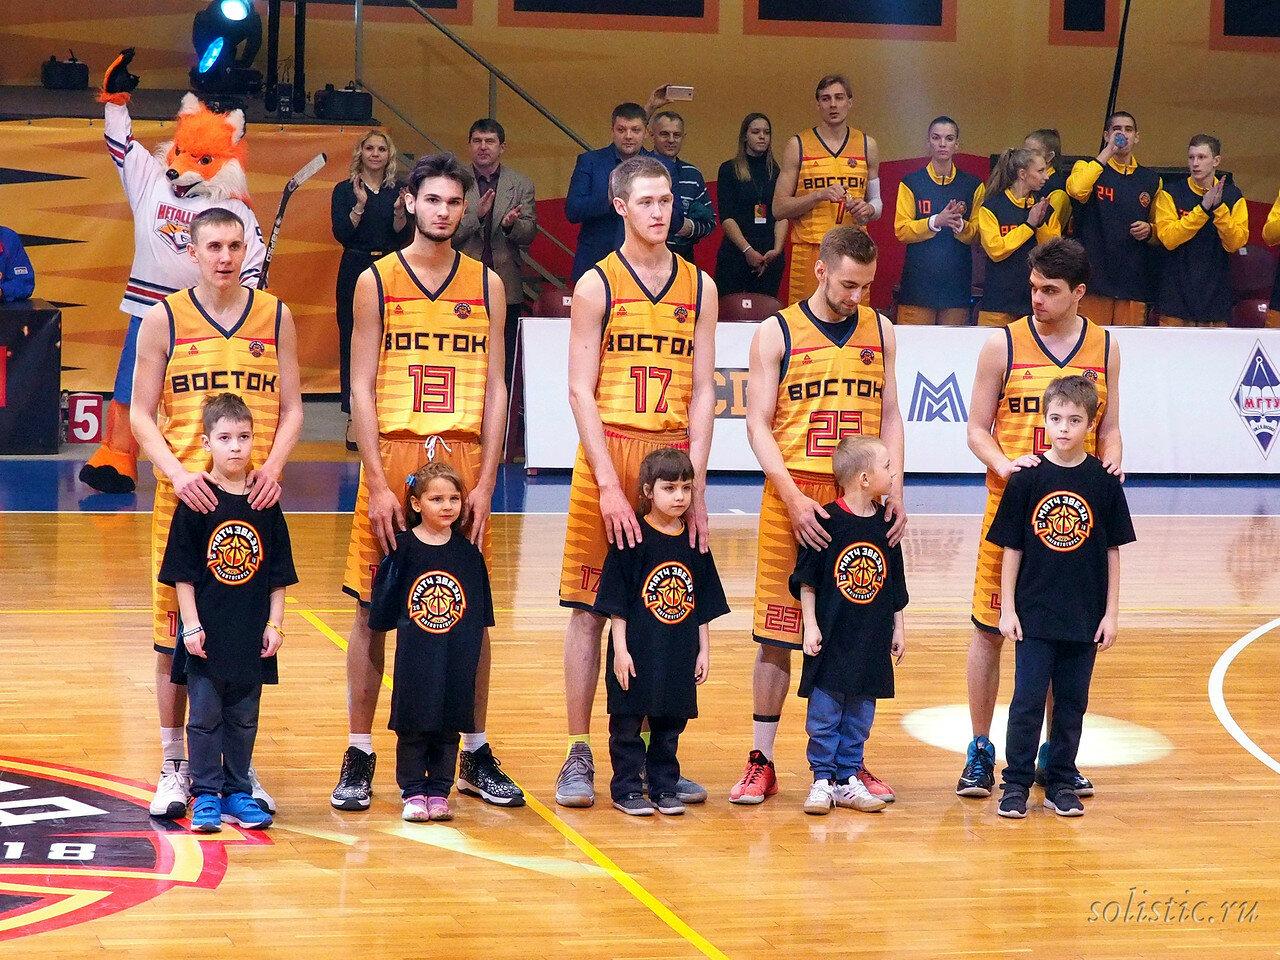 48 Матч звезд АСБ 2018 (ассоциации студенческого баскетбола)